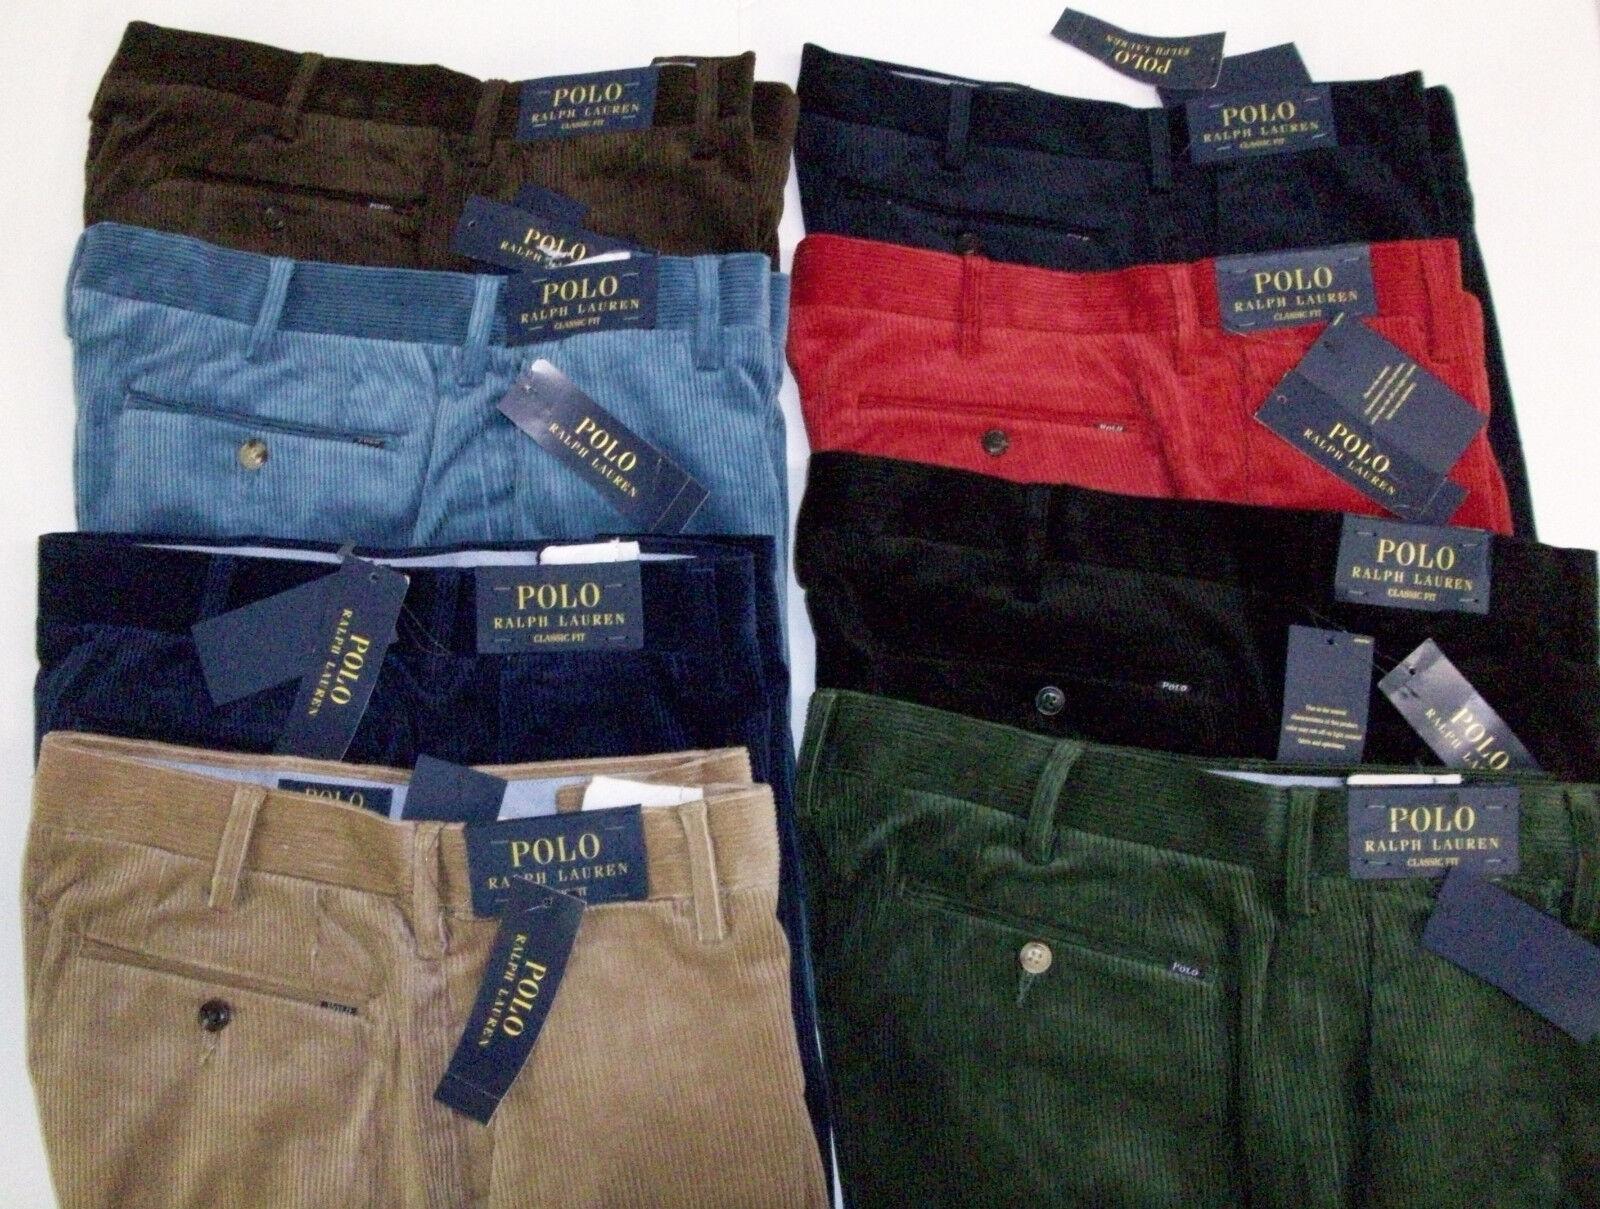 Polo Ralph Lauren Classic Fit Flat Corduroy Pants Stretch Cords  W  Badge NWT